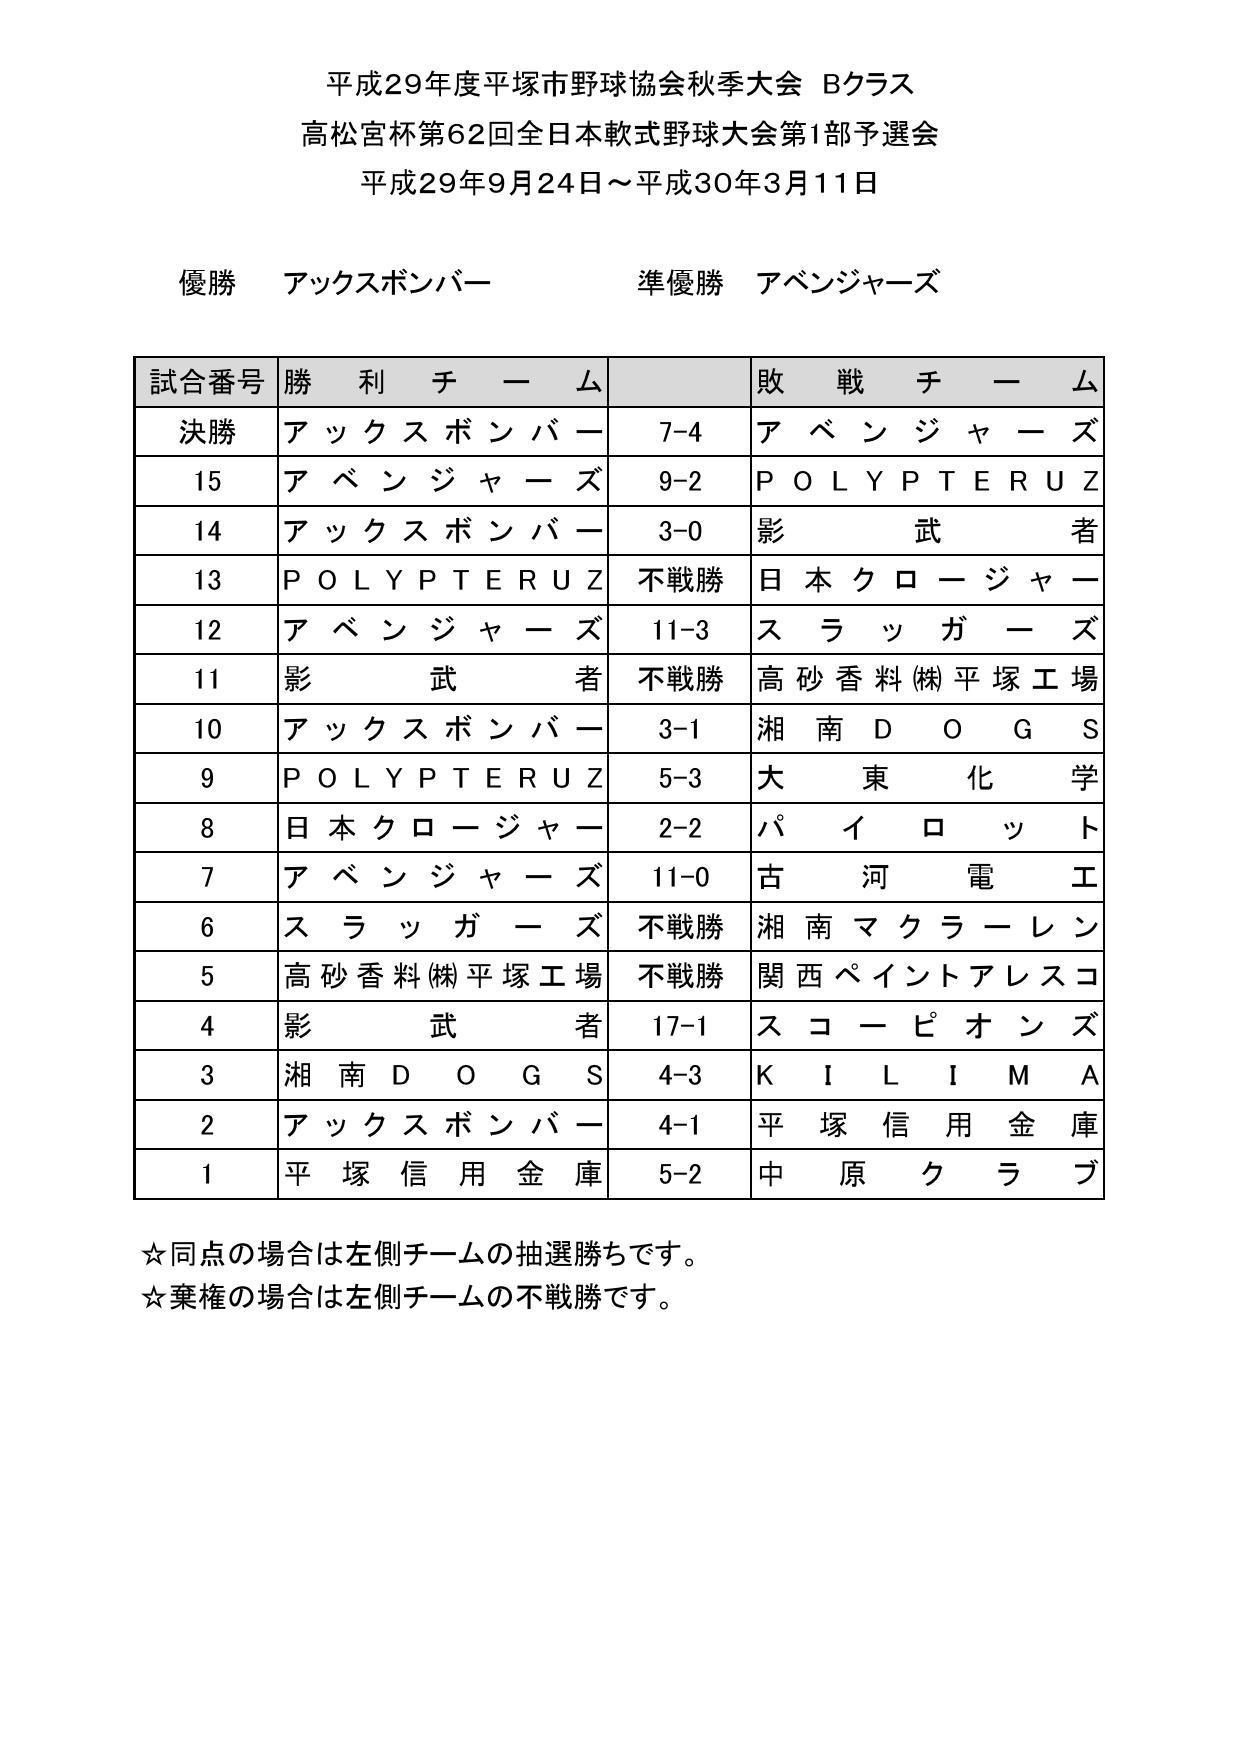 29aub_000001.jpg